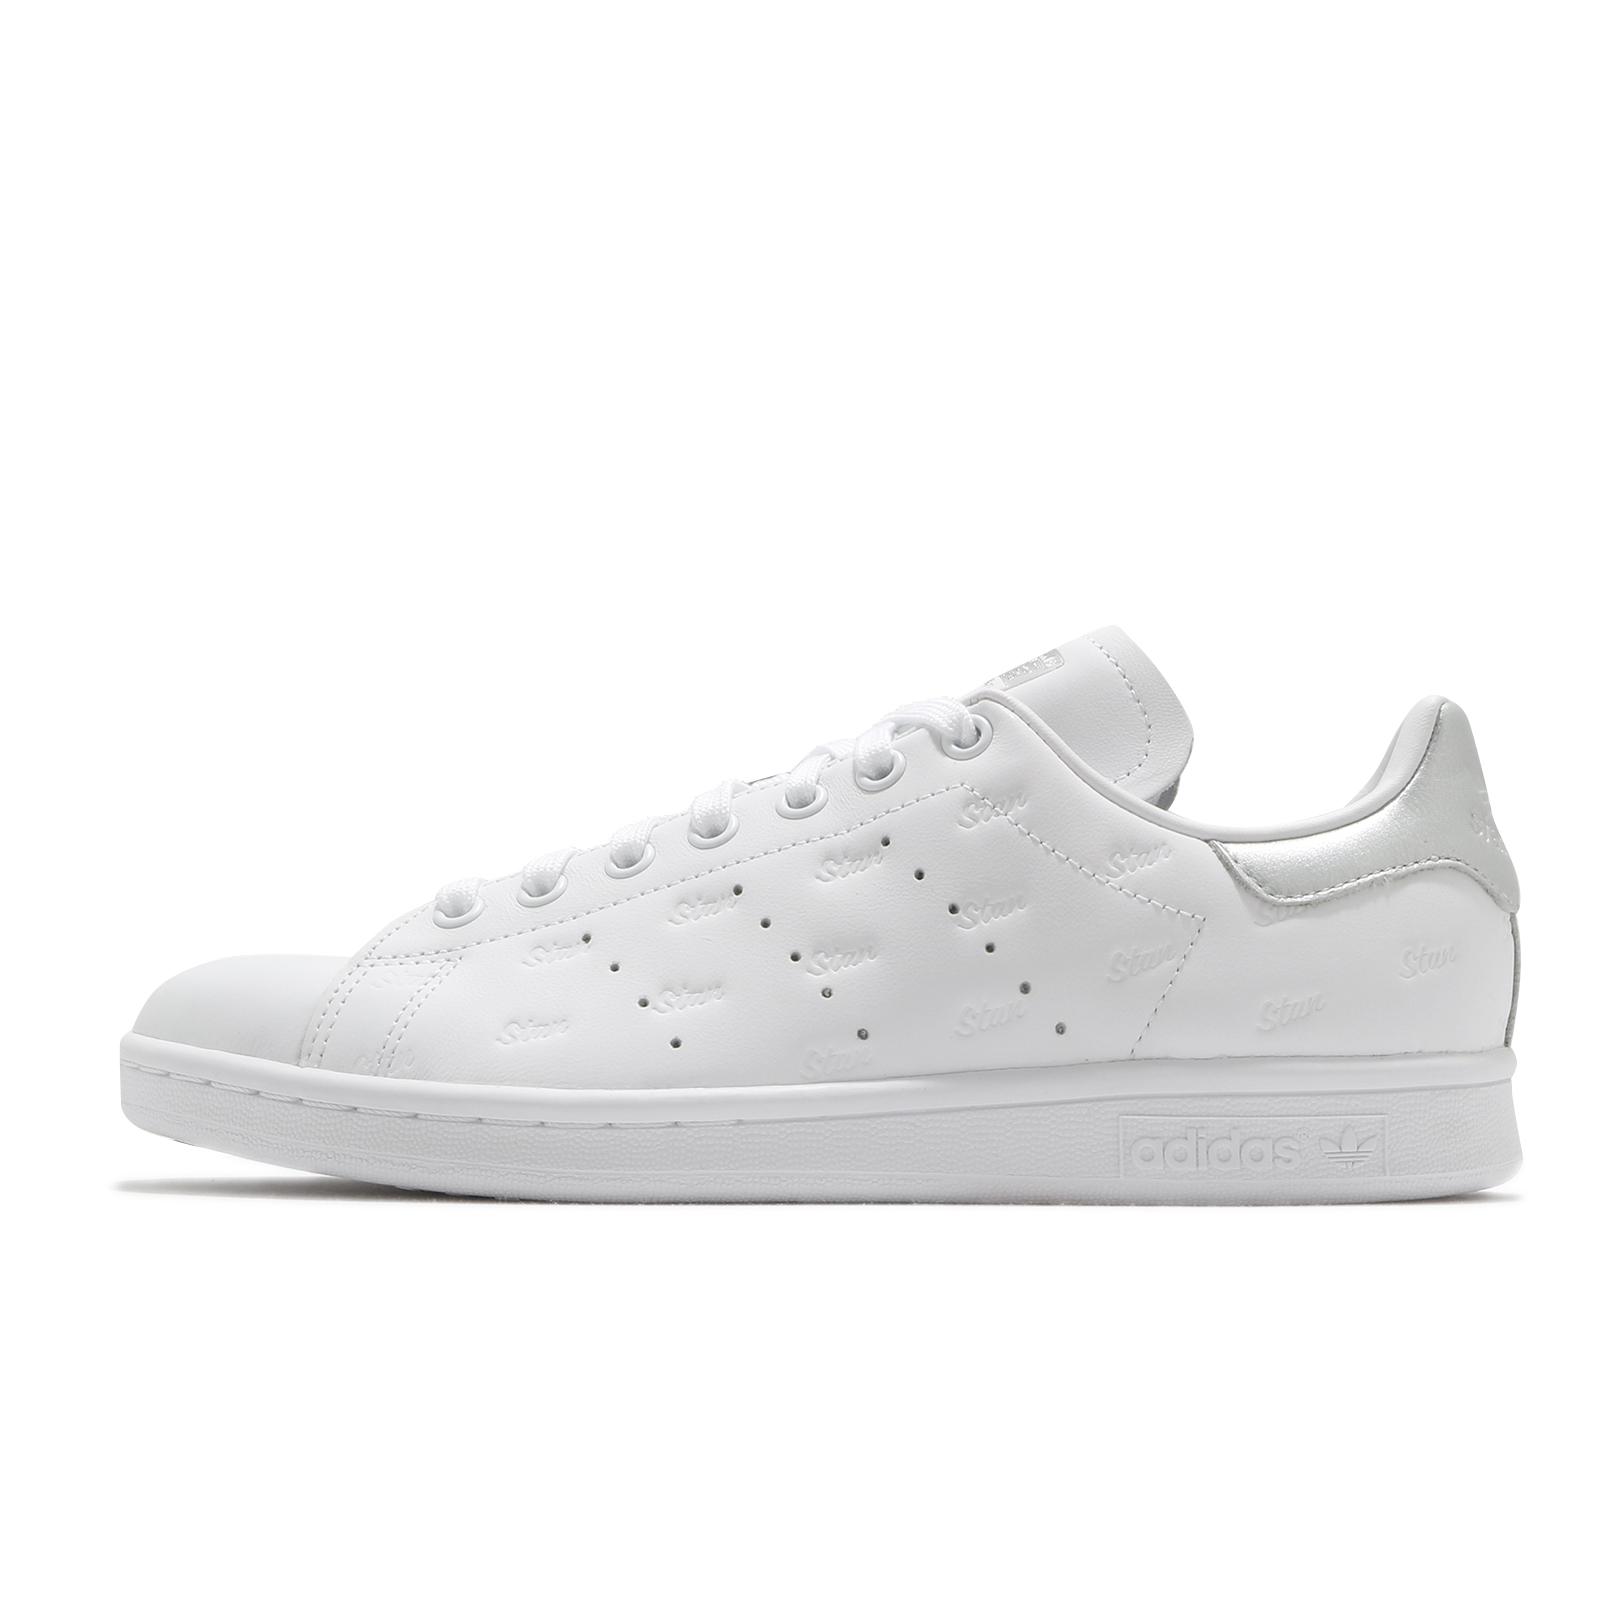 adidas 休閒鞋 Stan Smith W 白 銀 小白鞋 三葉草 愛迪達 女鞋 【ACS】 EF6854